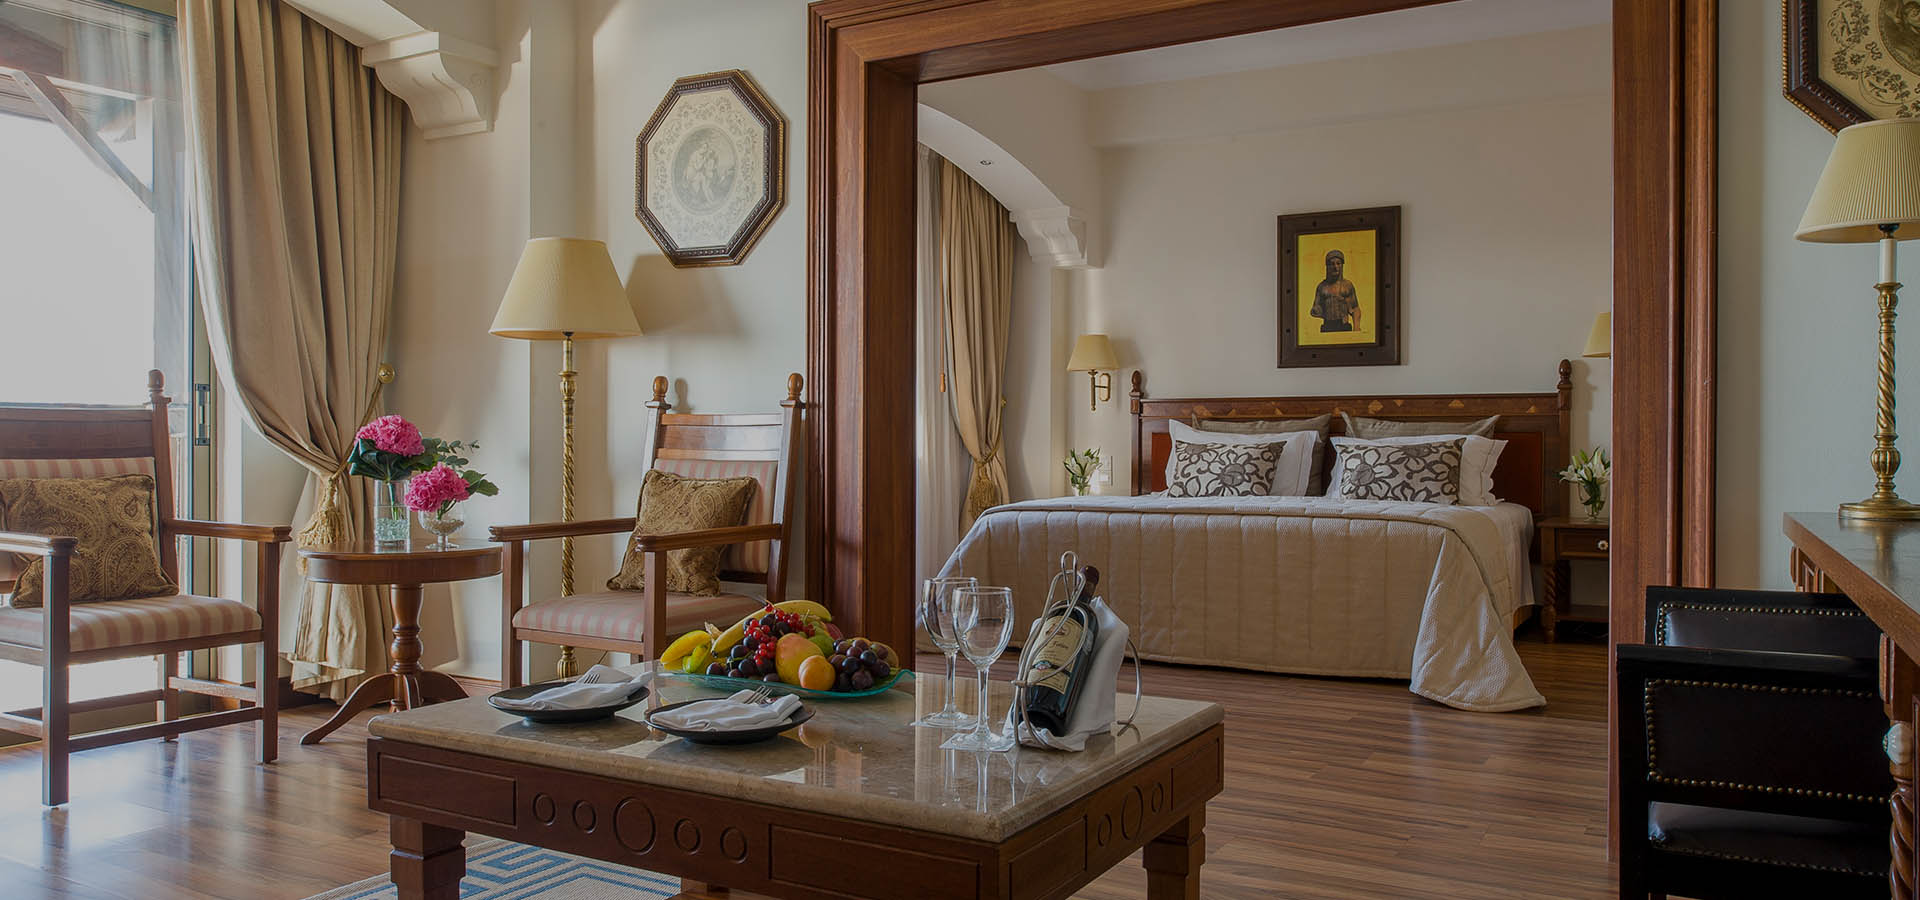 dressing artemis cool cuisine et dressing with dressing artemis stunning sophia kokosalaki. Black Bedroom Furniture Sets. Home Design Ideas